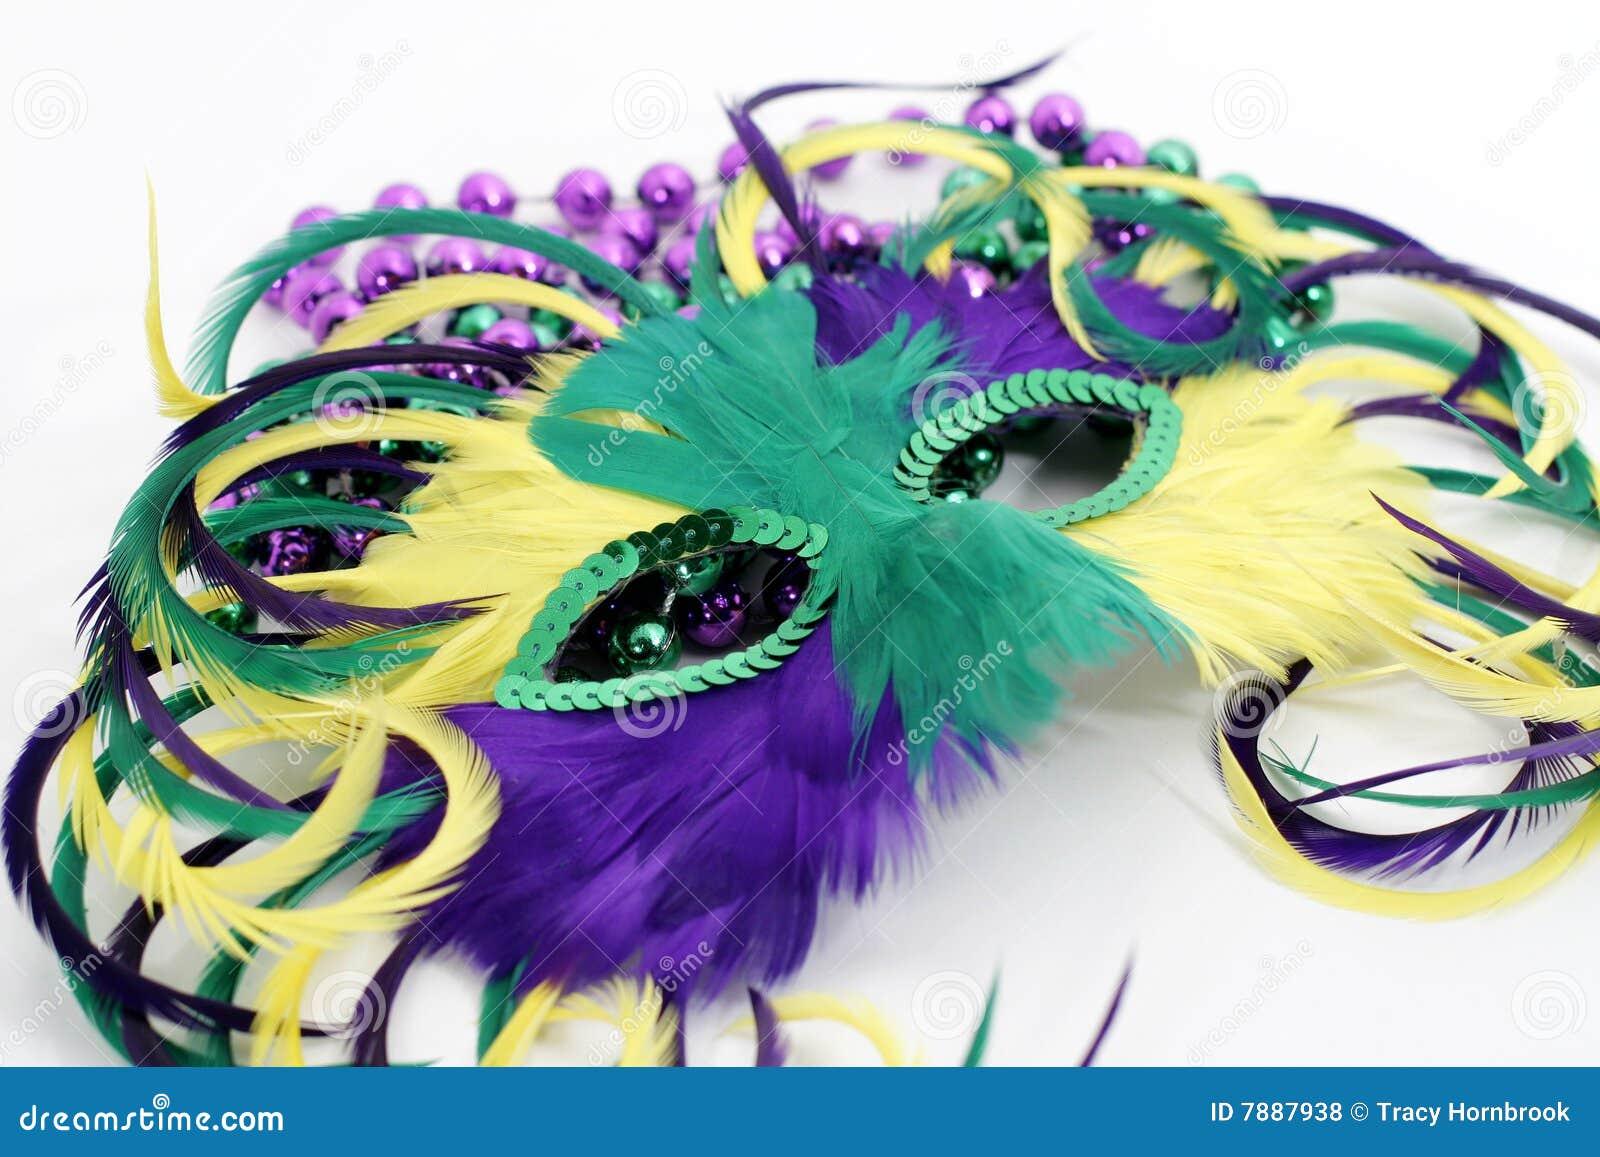 Mardi Gras Beads Clip Art Free Feather mardi gras mask with